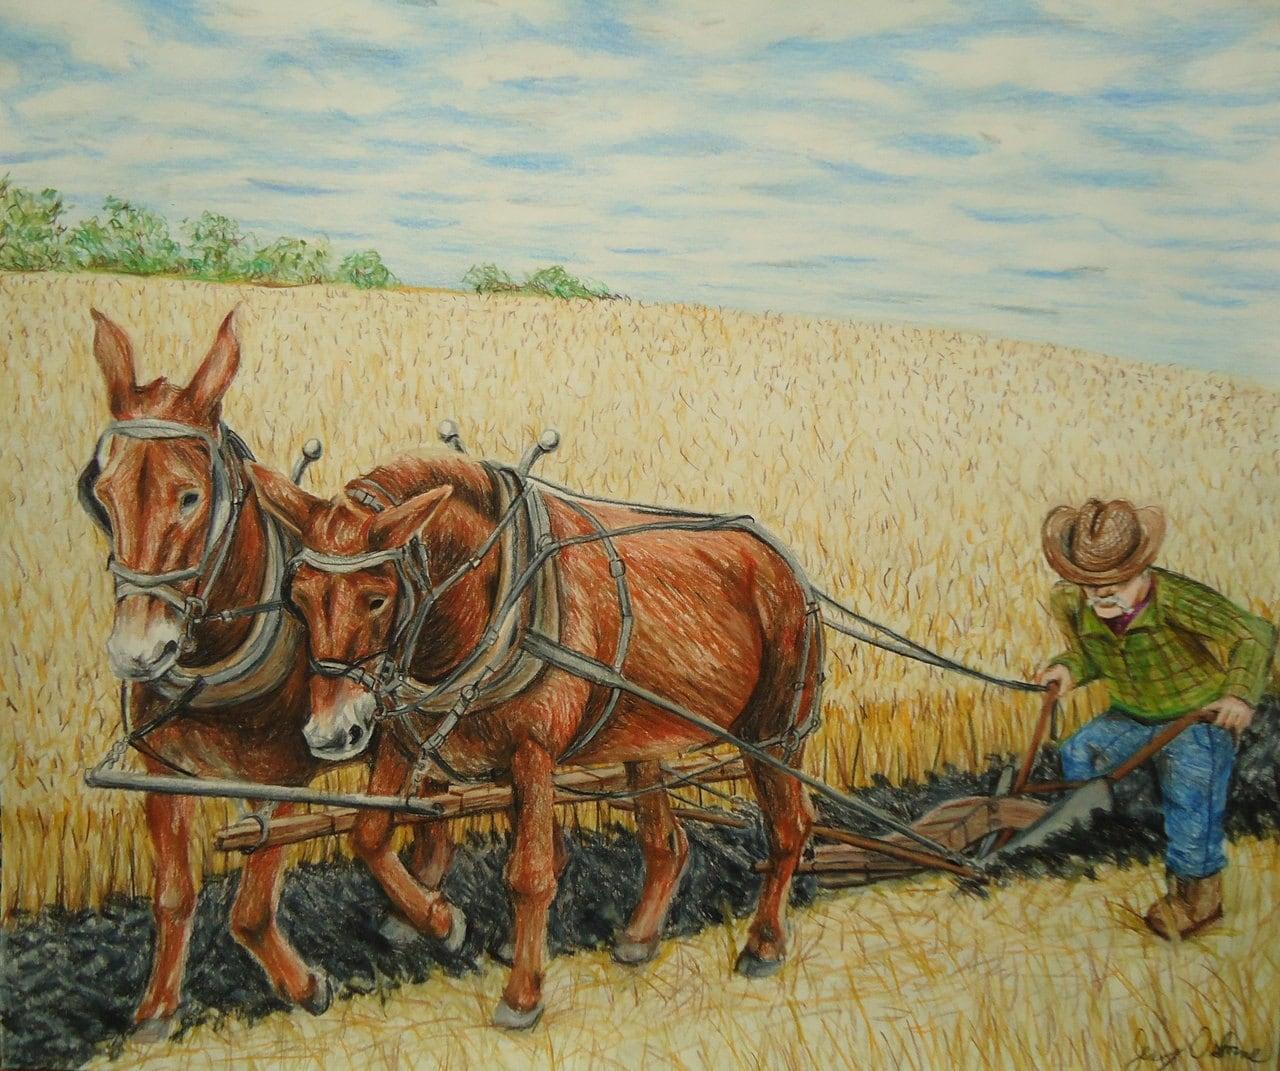 Original Mule pencil drawing Rustic home decor Farm